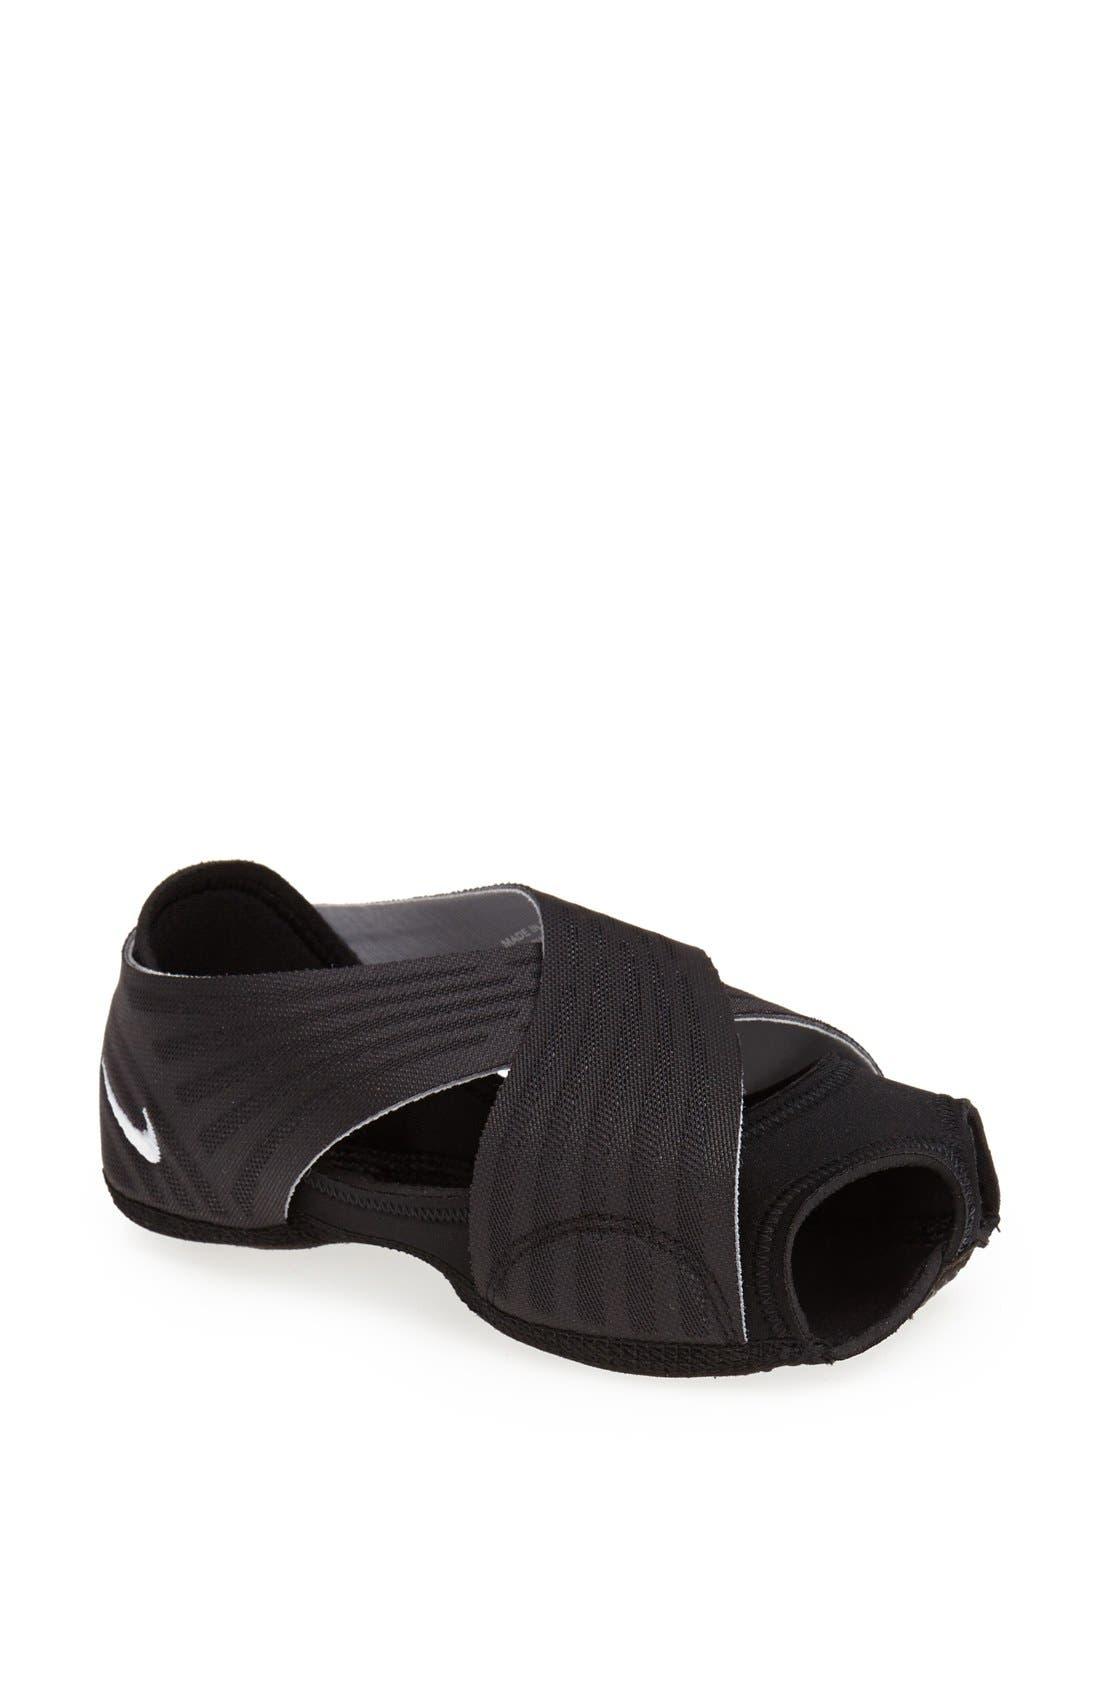 'Studio Wrap 2' Yoga Training Shoe, Main, color, 010